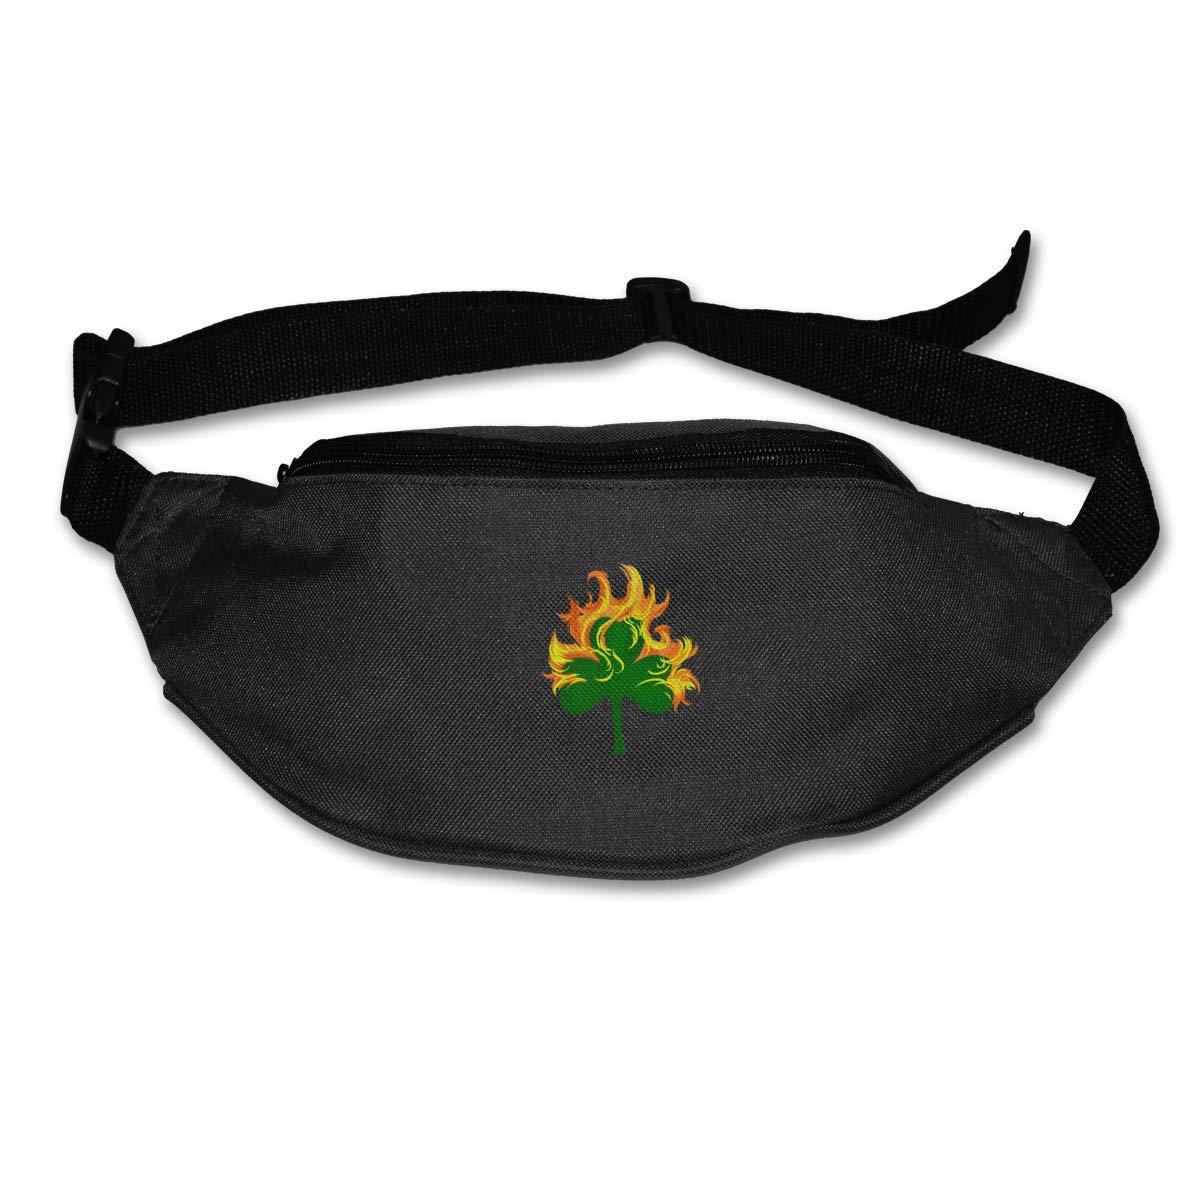 Irish Clover Burning Sport Waist Packs Fanny Pack Adjustable For Hike